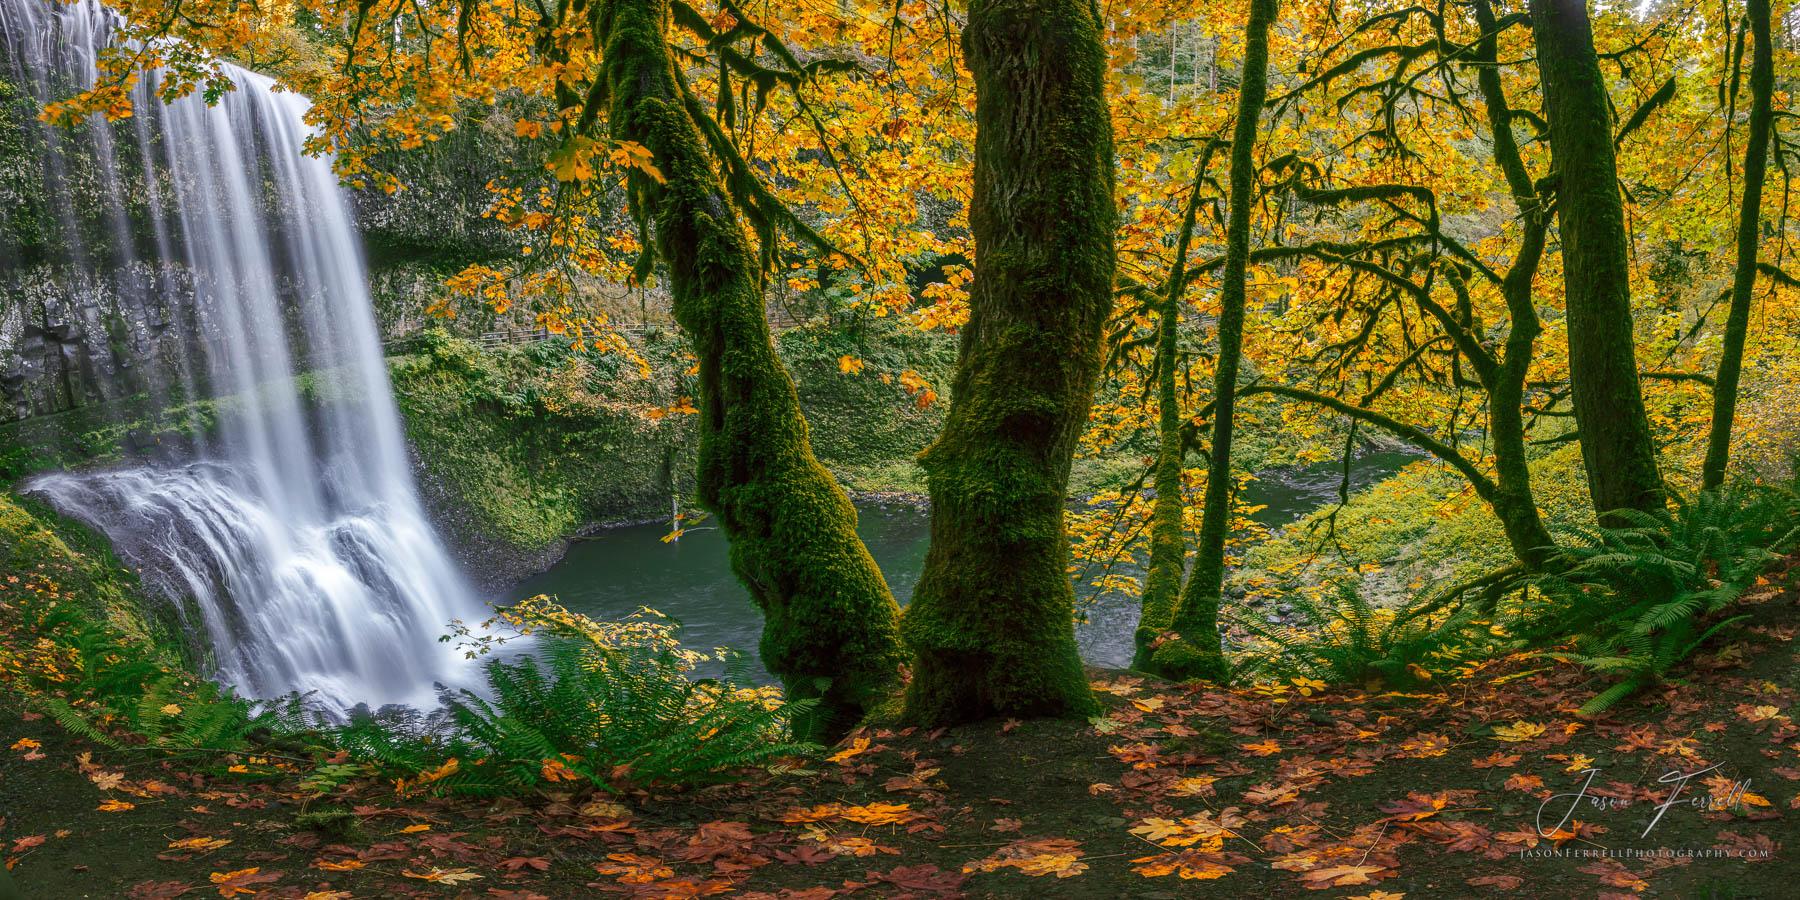 silver falls state park, oregon, autumn dream, waterfall, photo